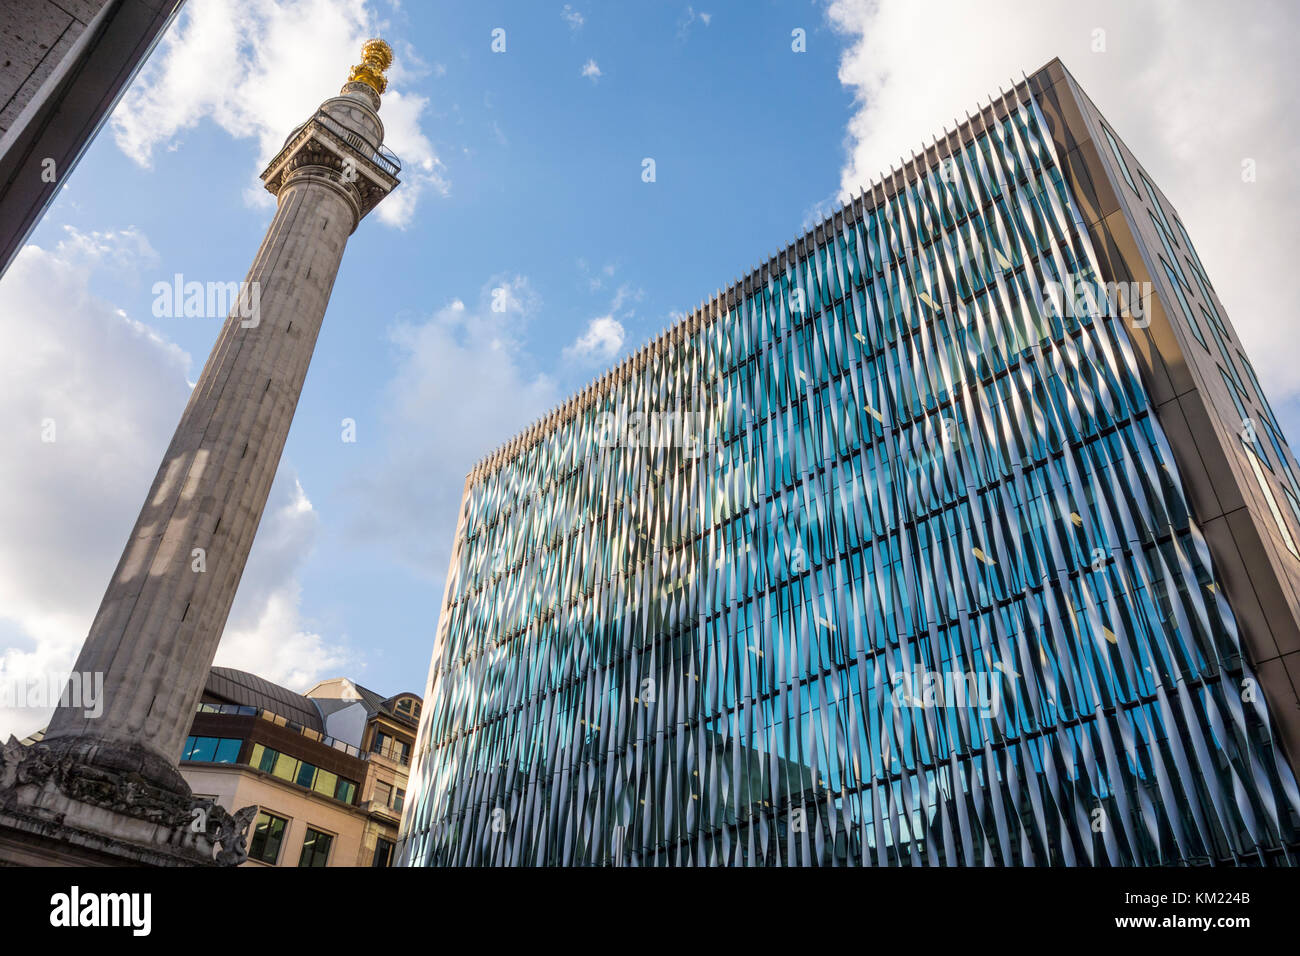 El edificio monumento por Ken Shuttleworth's Make arquitectos en 11-19 Monumento Street, City de Londres, Reino Imagen De Stock